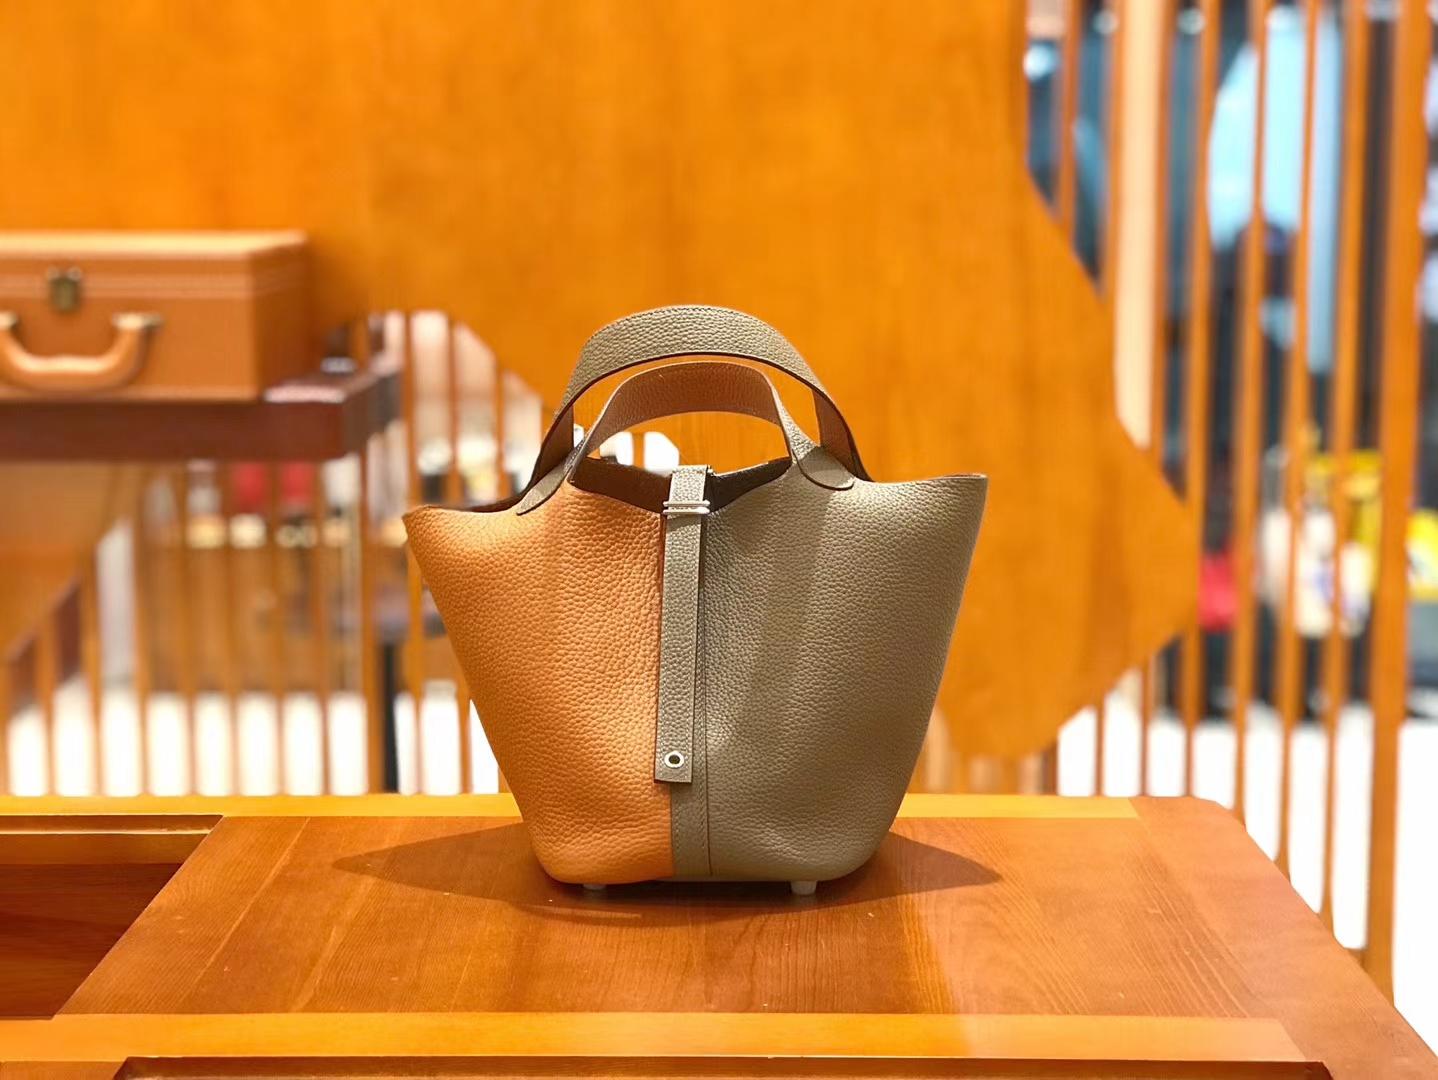 Hermès(爱马仕)Piction 18cm 大象灰拼金棕色 银扣 Togo小牛皮 全手工缝制